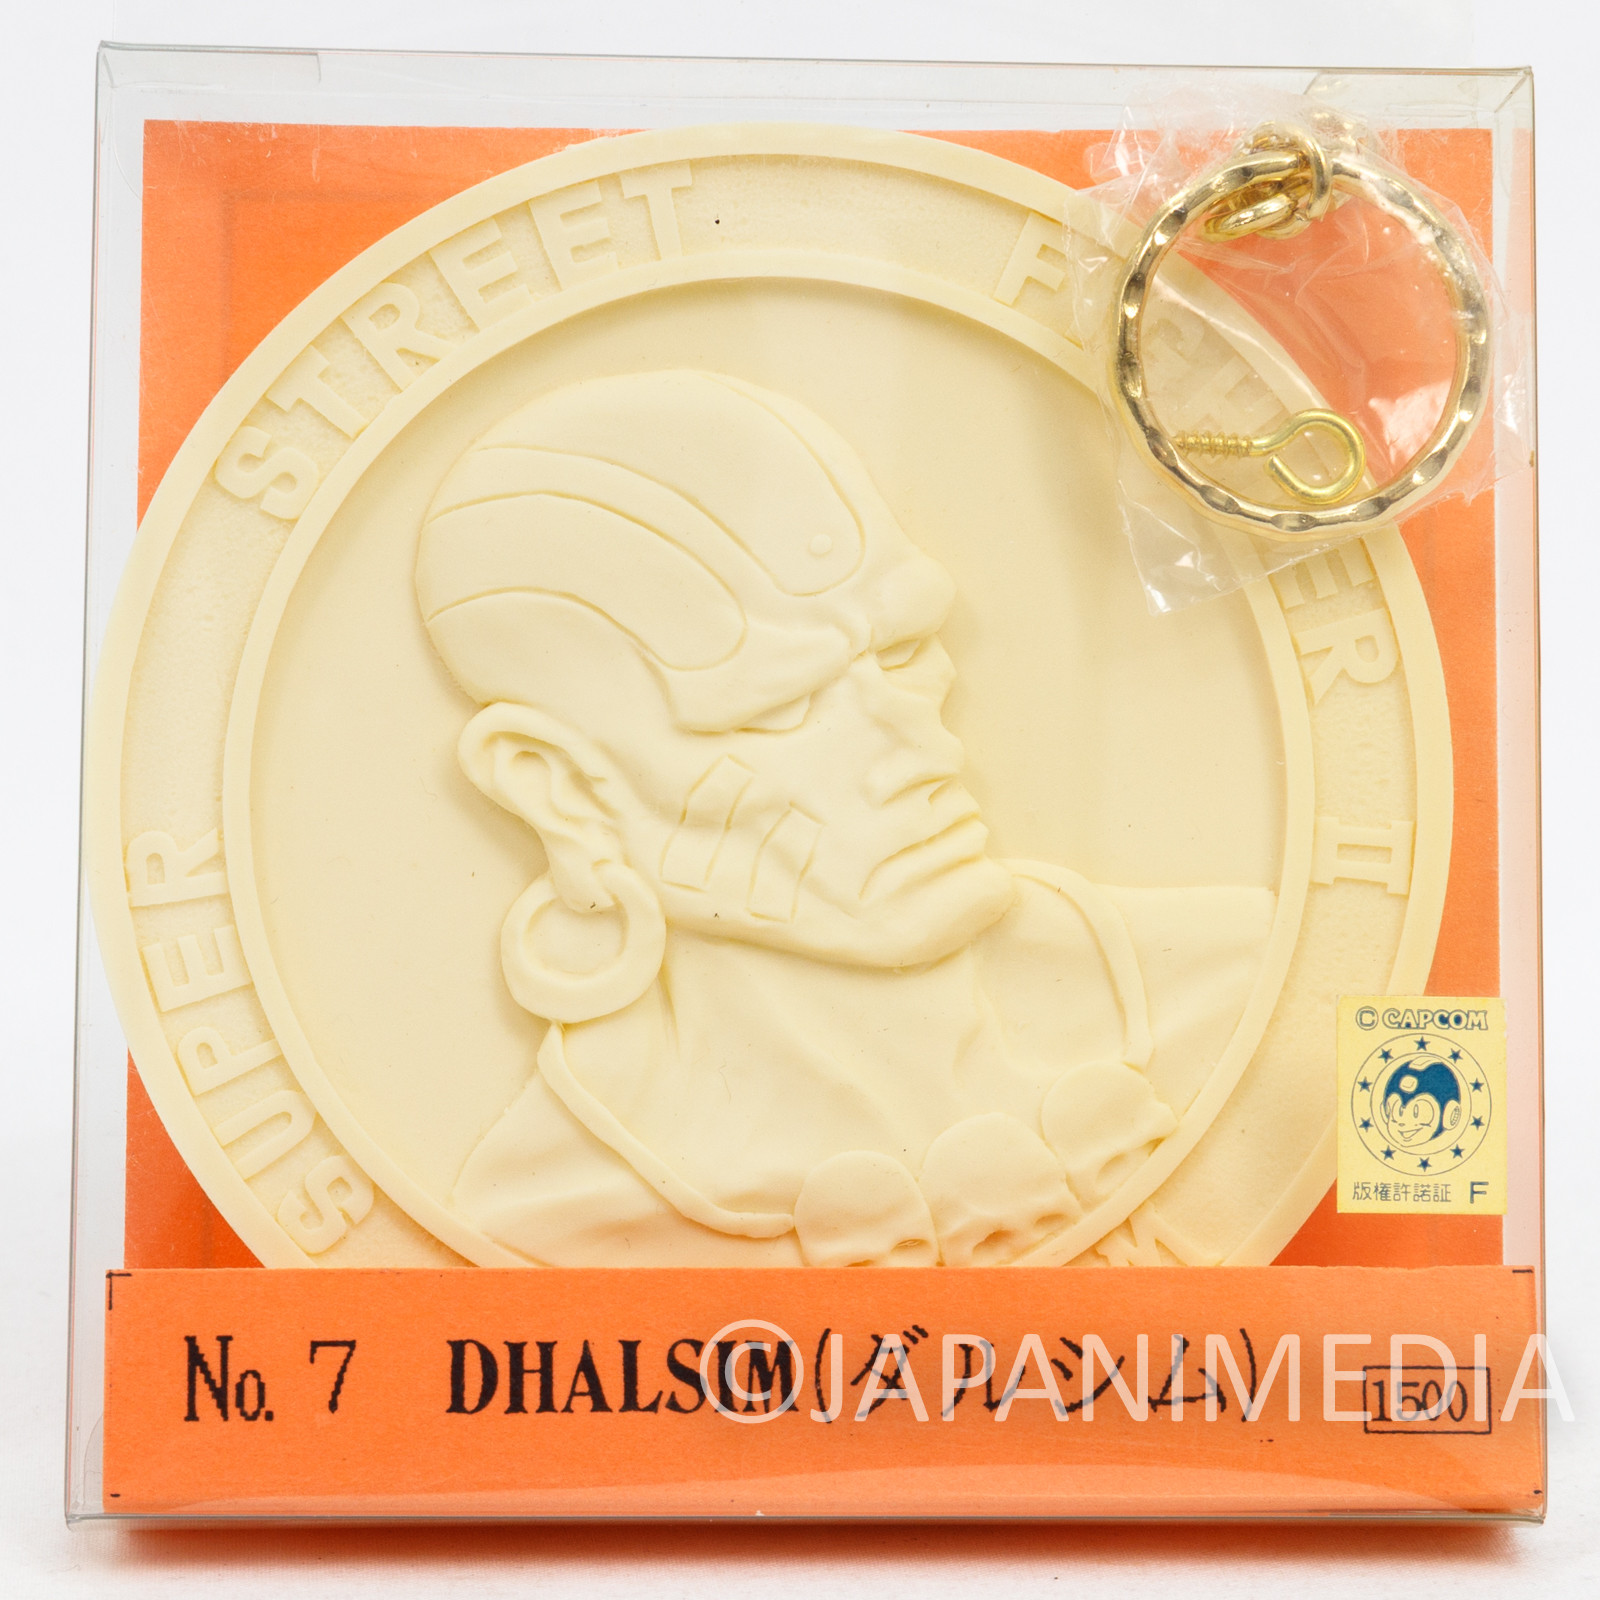 Street Fighter 2 Dhalsim Medal Type Resin Cast Model kit Volks Capcom FIGURE